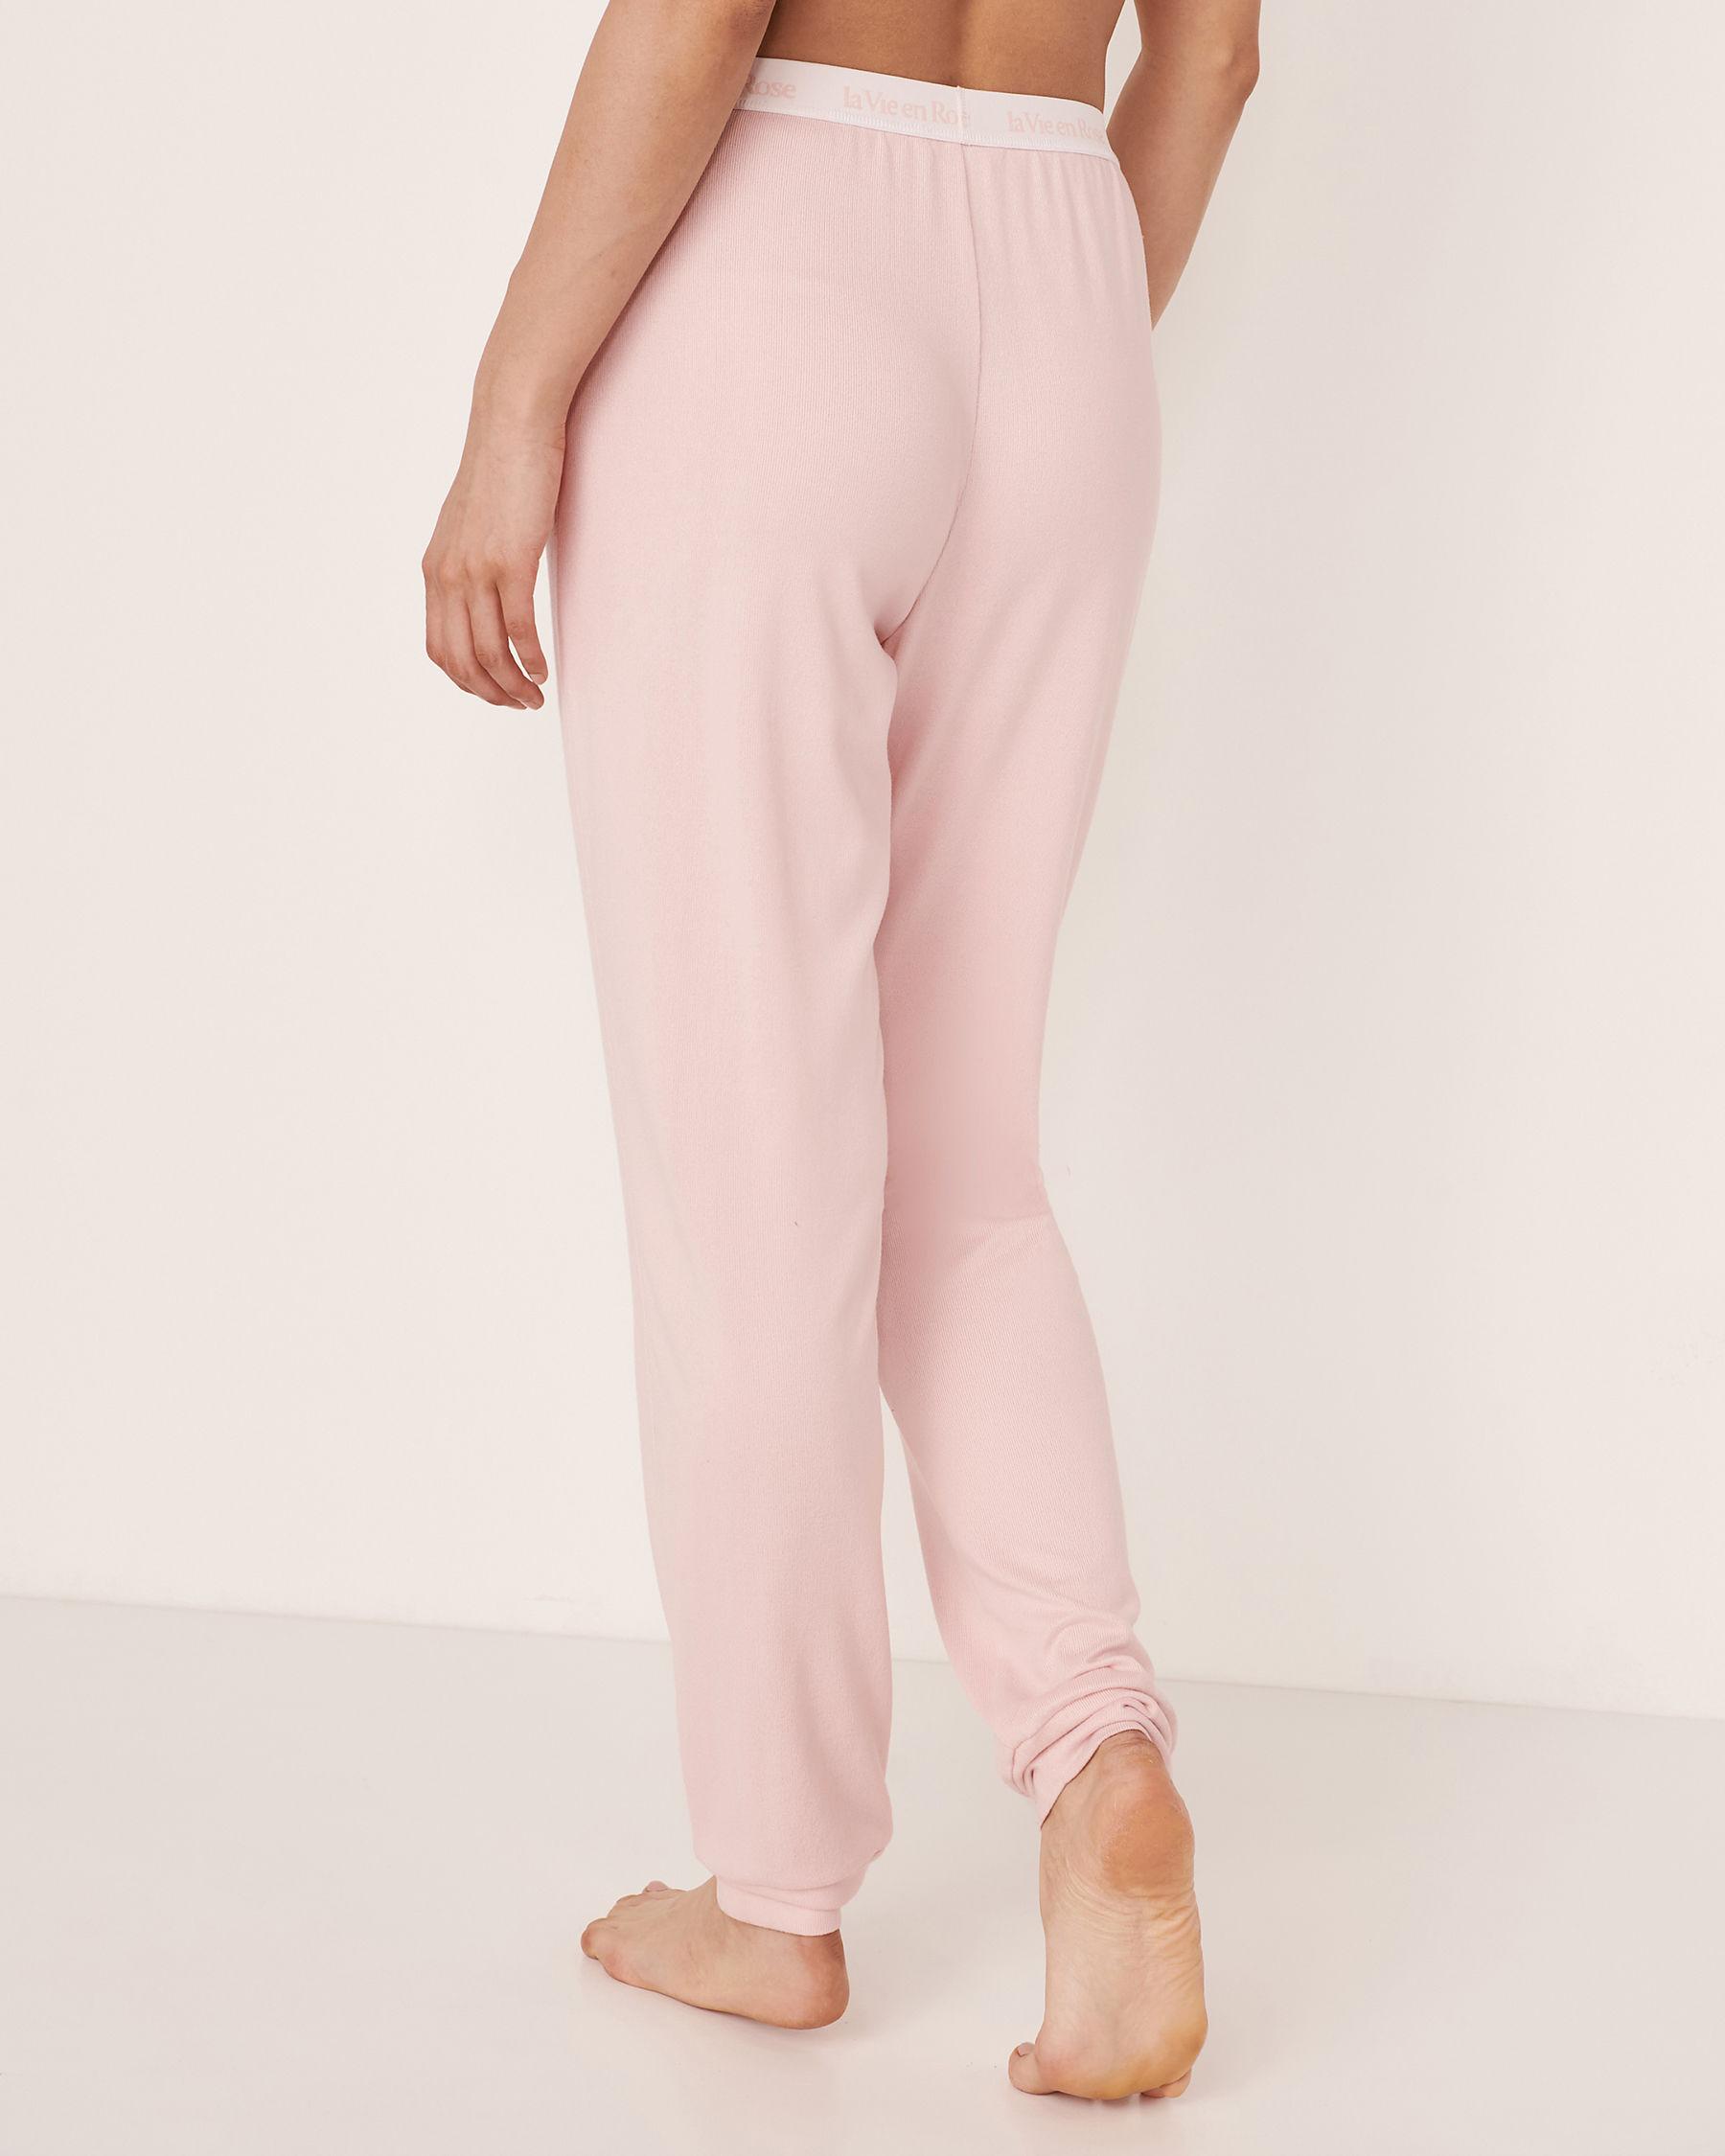 LA VIE EN ROSE Recycled Fibers Pyjama Pant Light pink 40200088 - View2